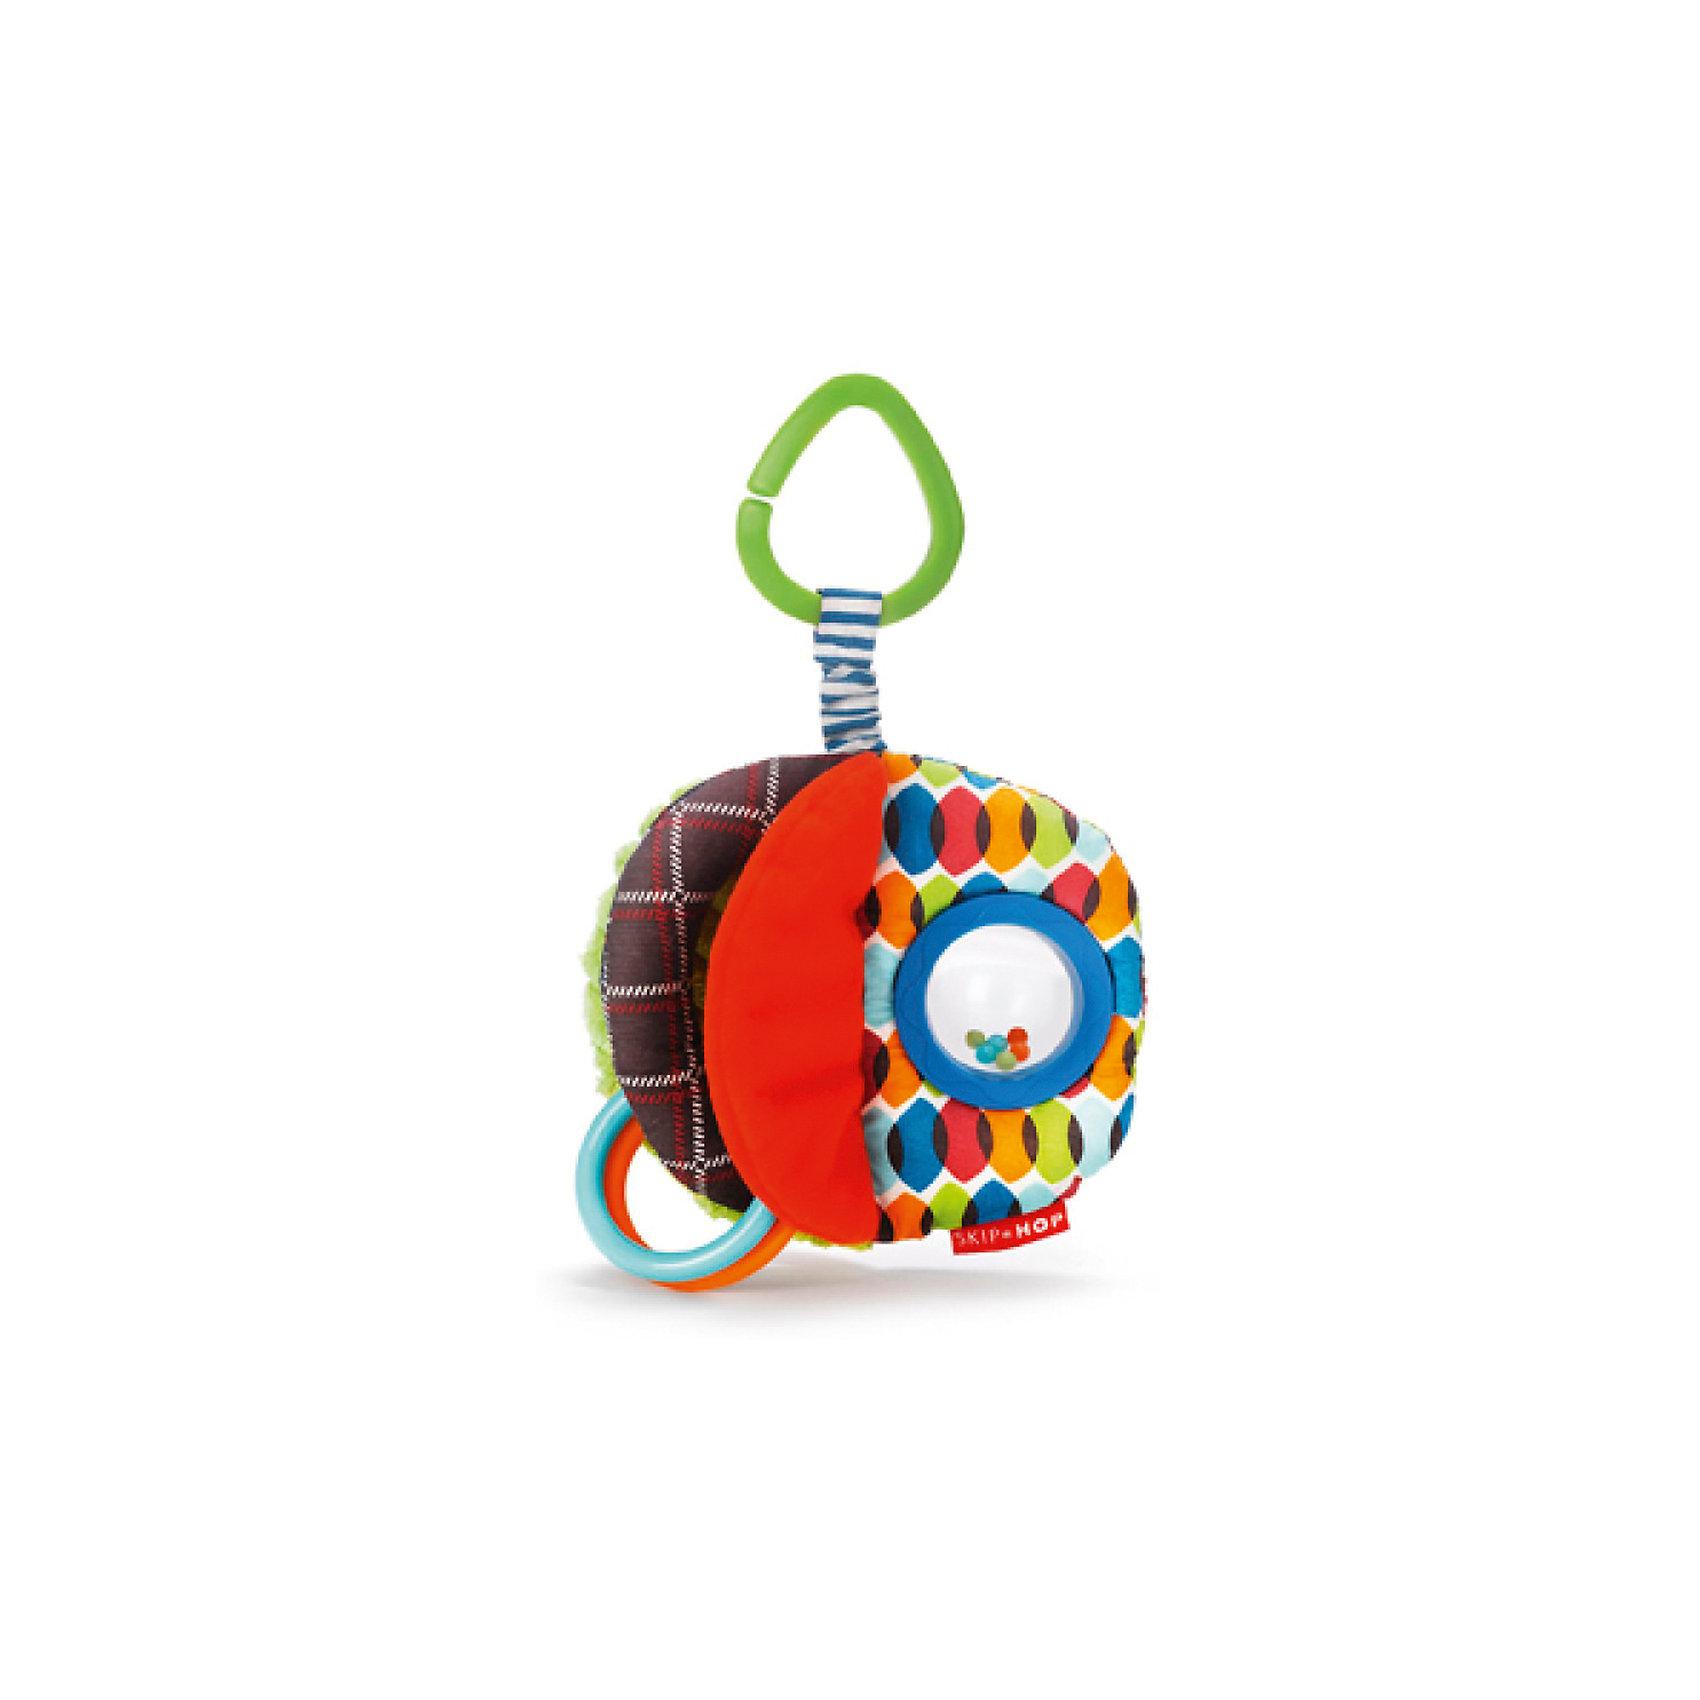 Развивающая игрушка-подвеска Мячик, Skip HopПодвески<br><br><br>Ширина мм: 139<br>Глубина мм: 228<br>Высота мм: 36<br>Вес г: 100<br>Возраст от месяцев: 6<br>Возраст до месяцев: 60<br>Пол: Унисекс<br>Возраст: Детский<br>SKU: 5516393